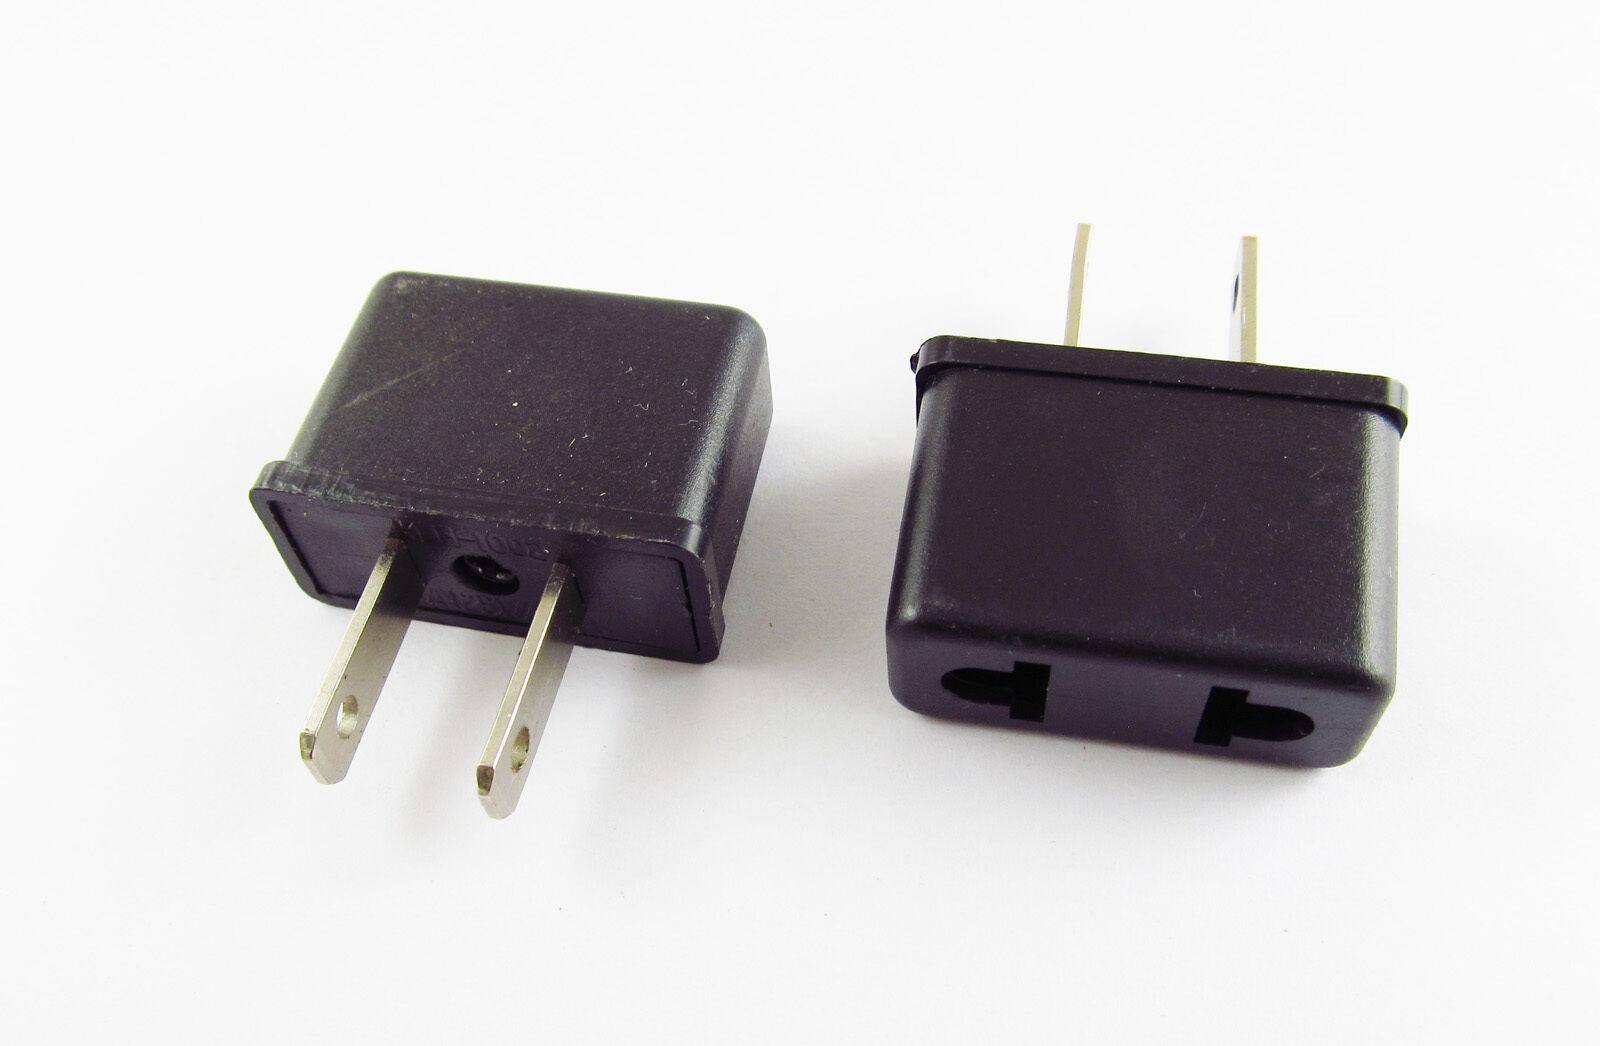 US USA To EU Europe EURO AC Power Wall Plug Travel Charger Adapter ConvertYJCA